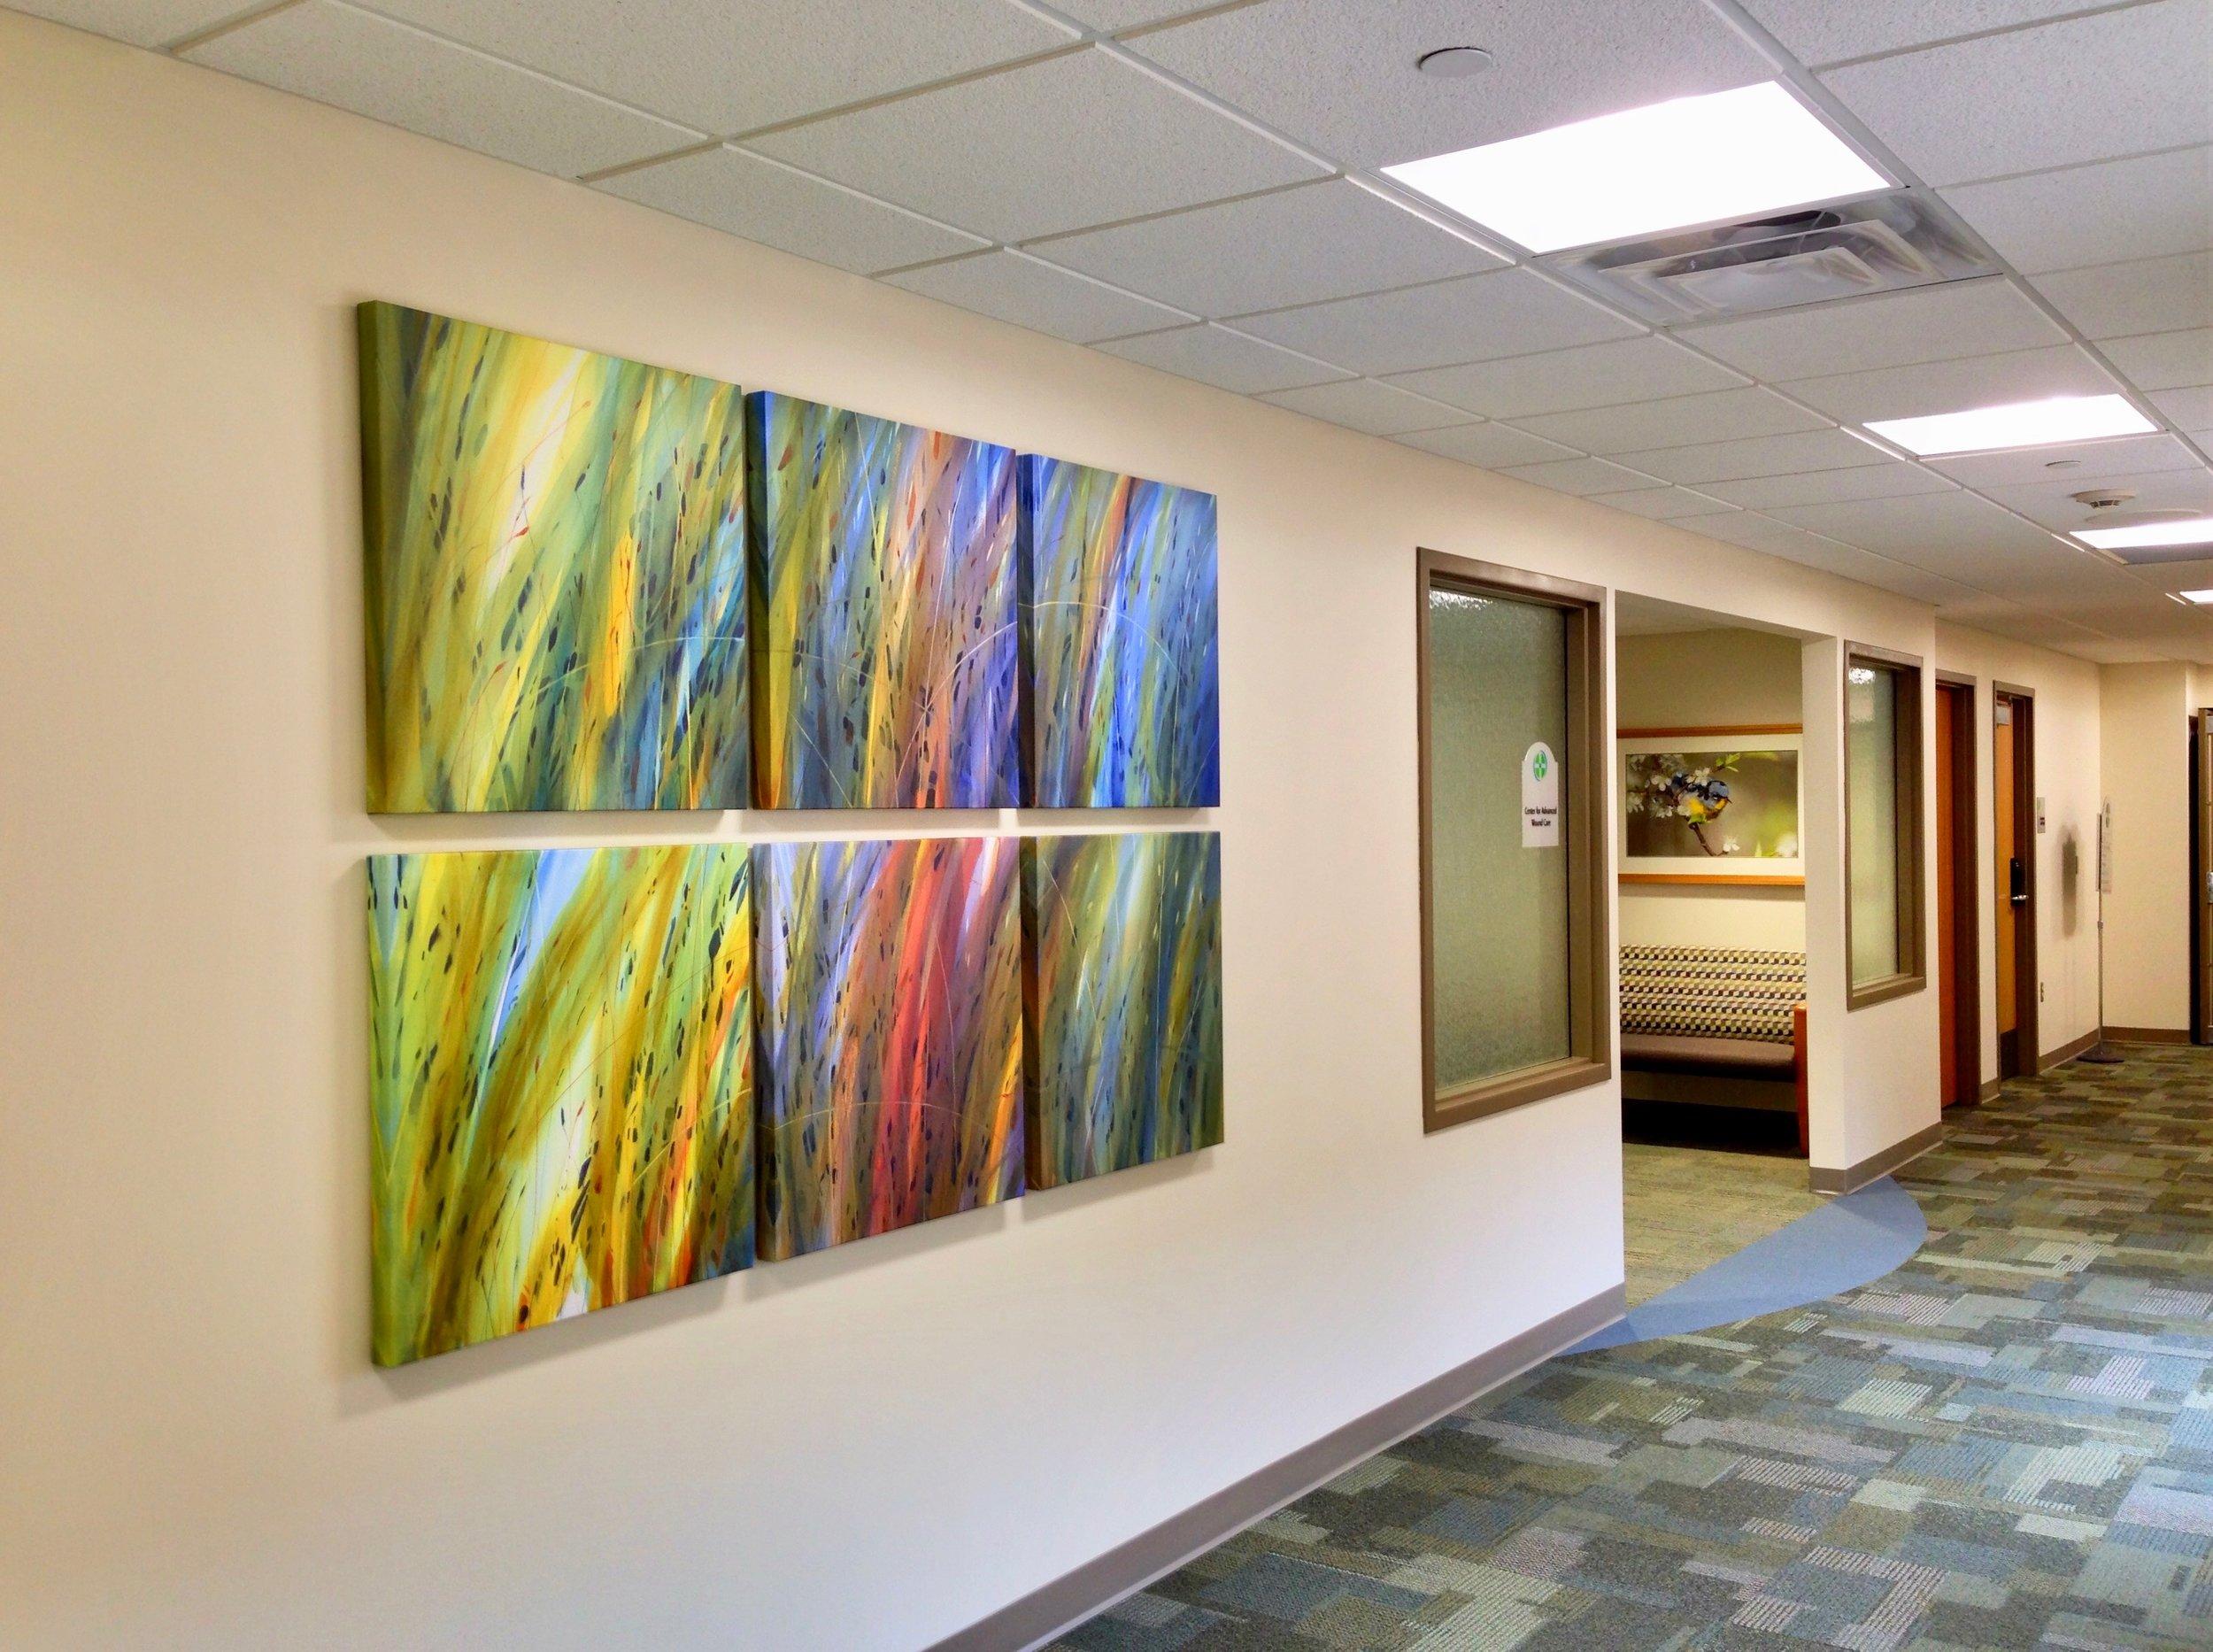 Ireland_Glencoe Regional Medical Center.jpg